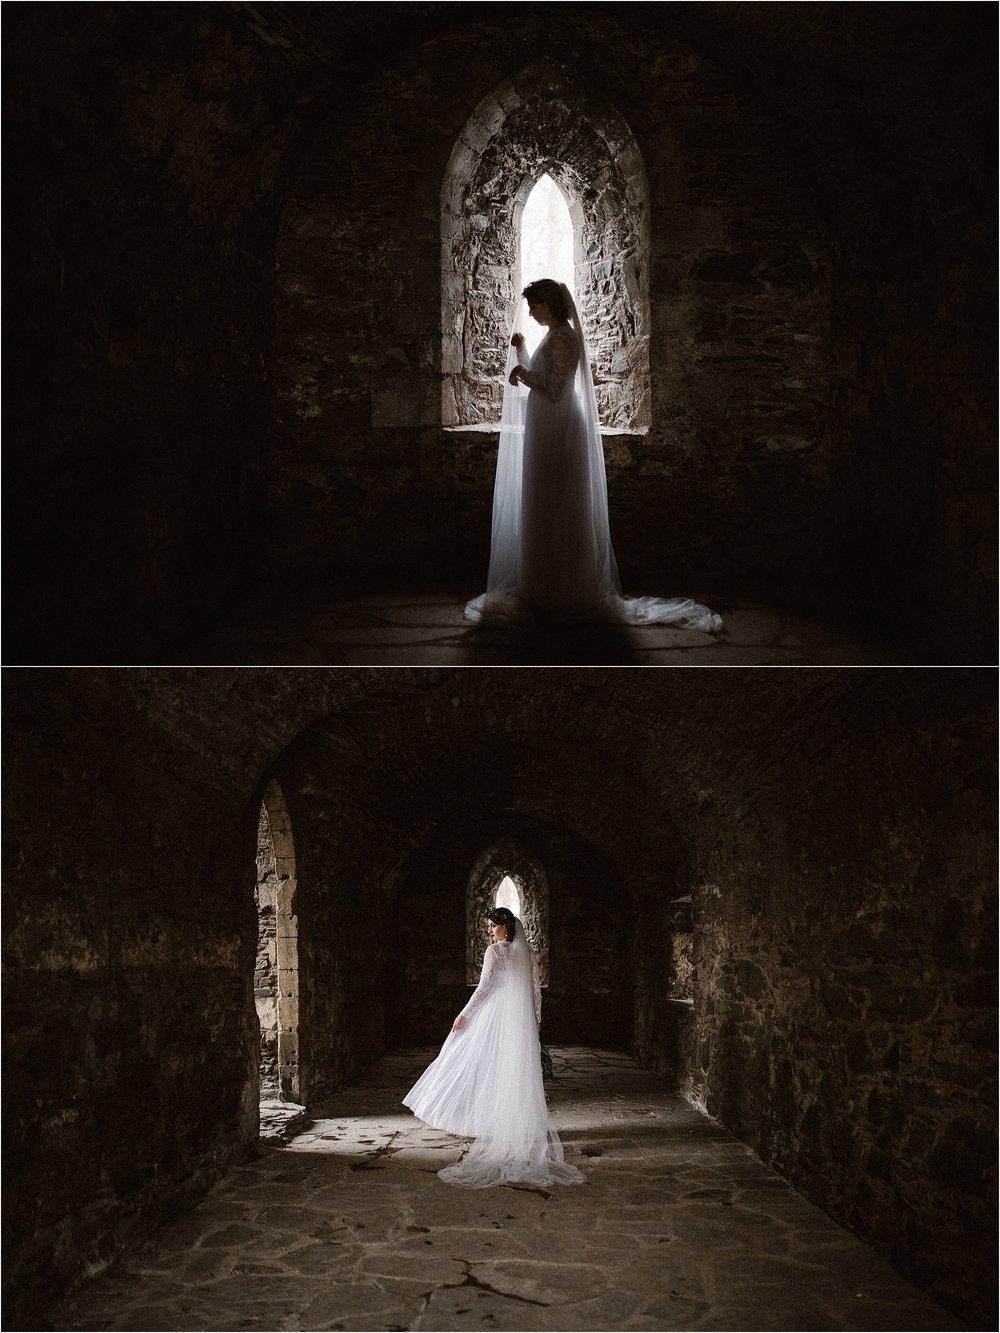 Valle-crucis-abbey-Llangollen-avonne-photography-195.jpg